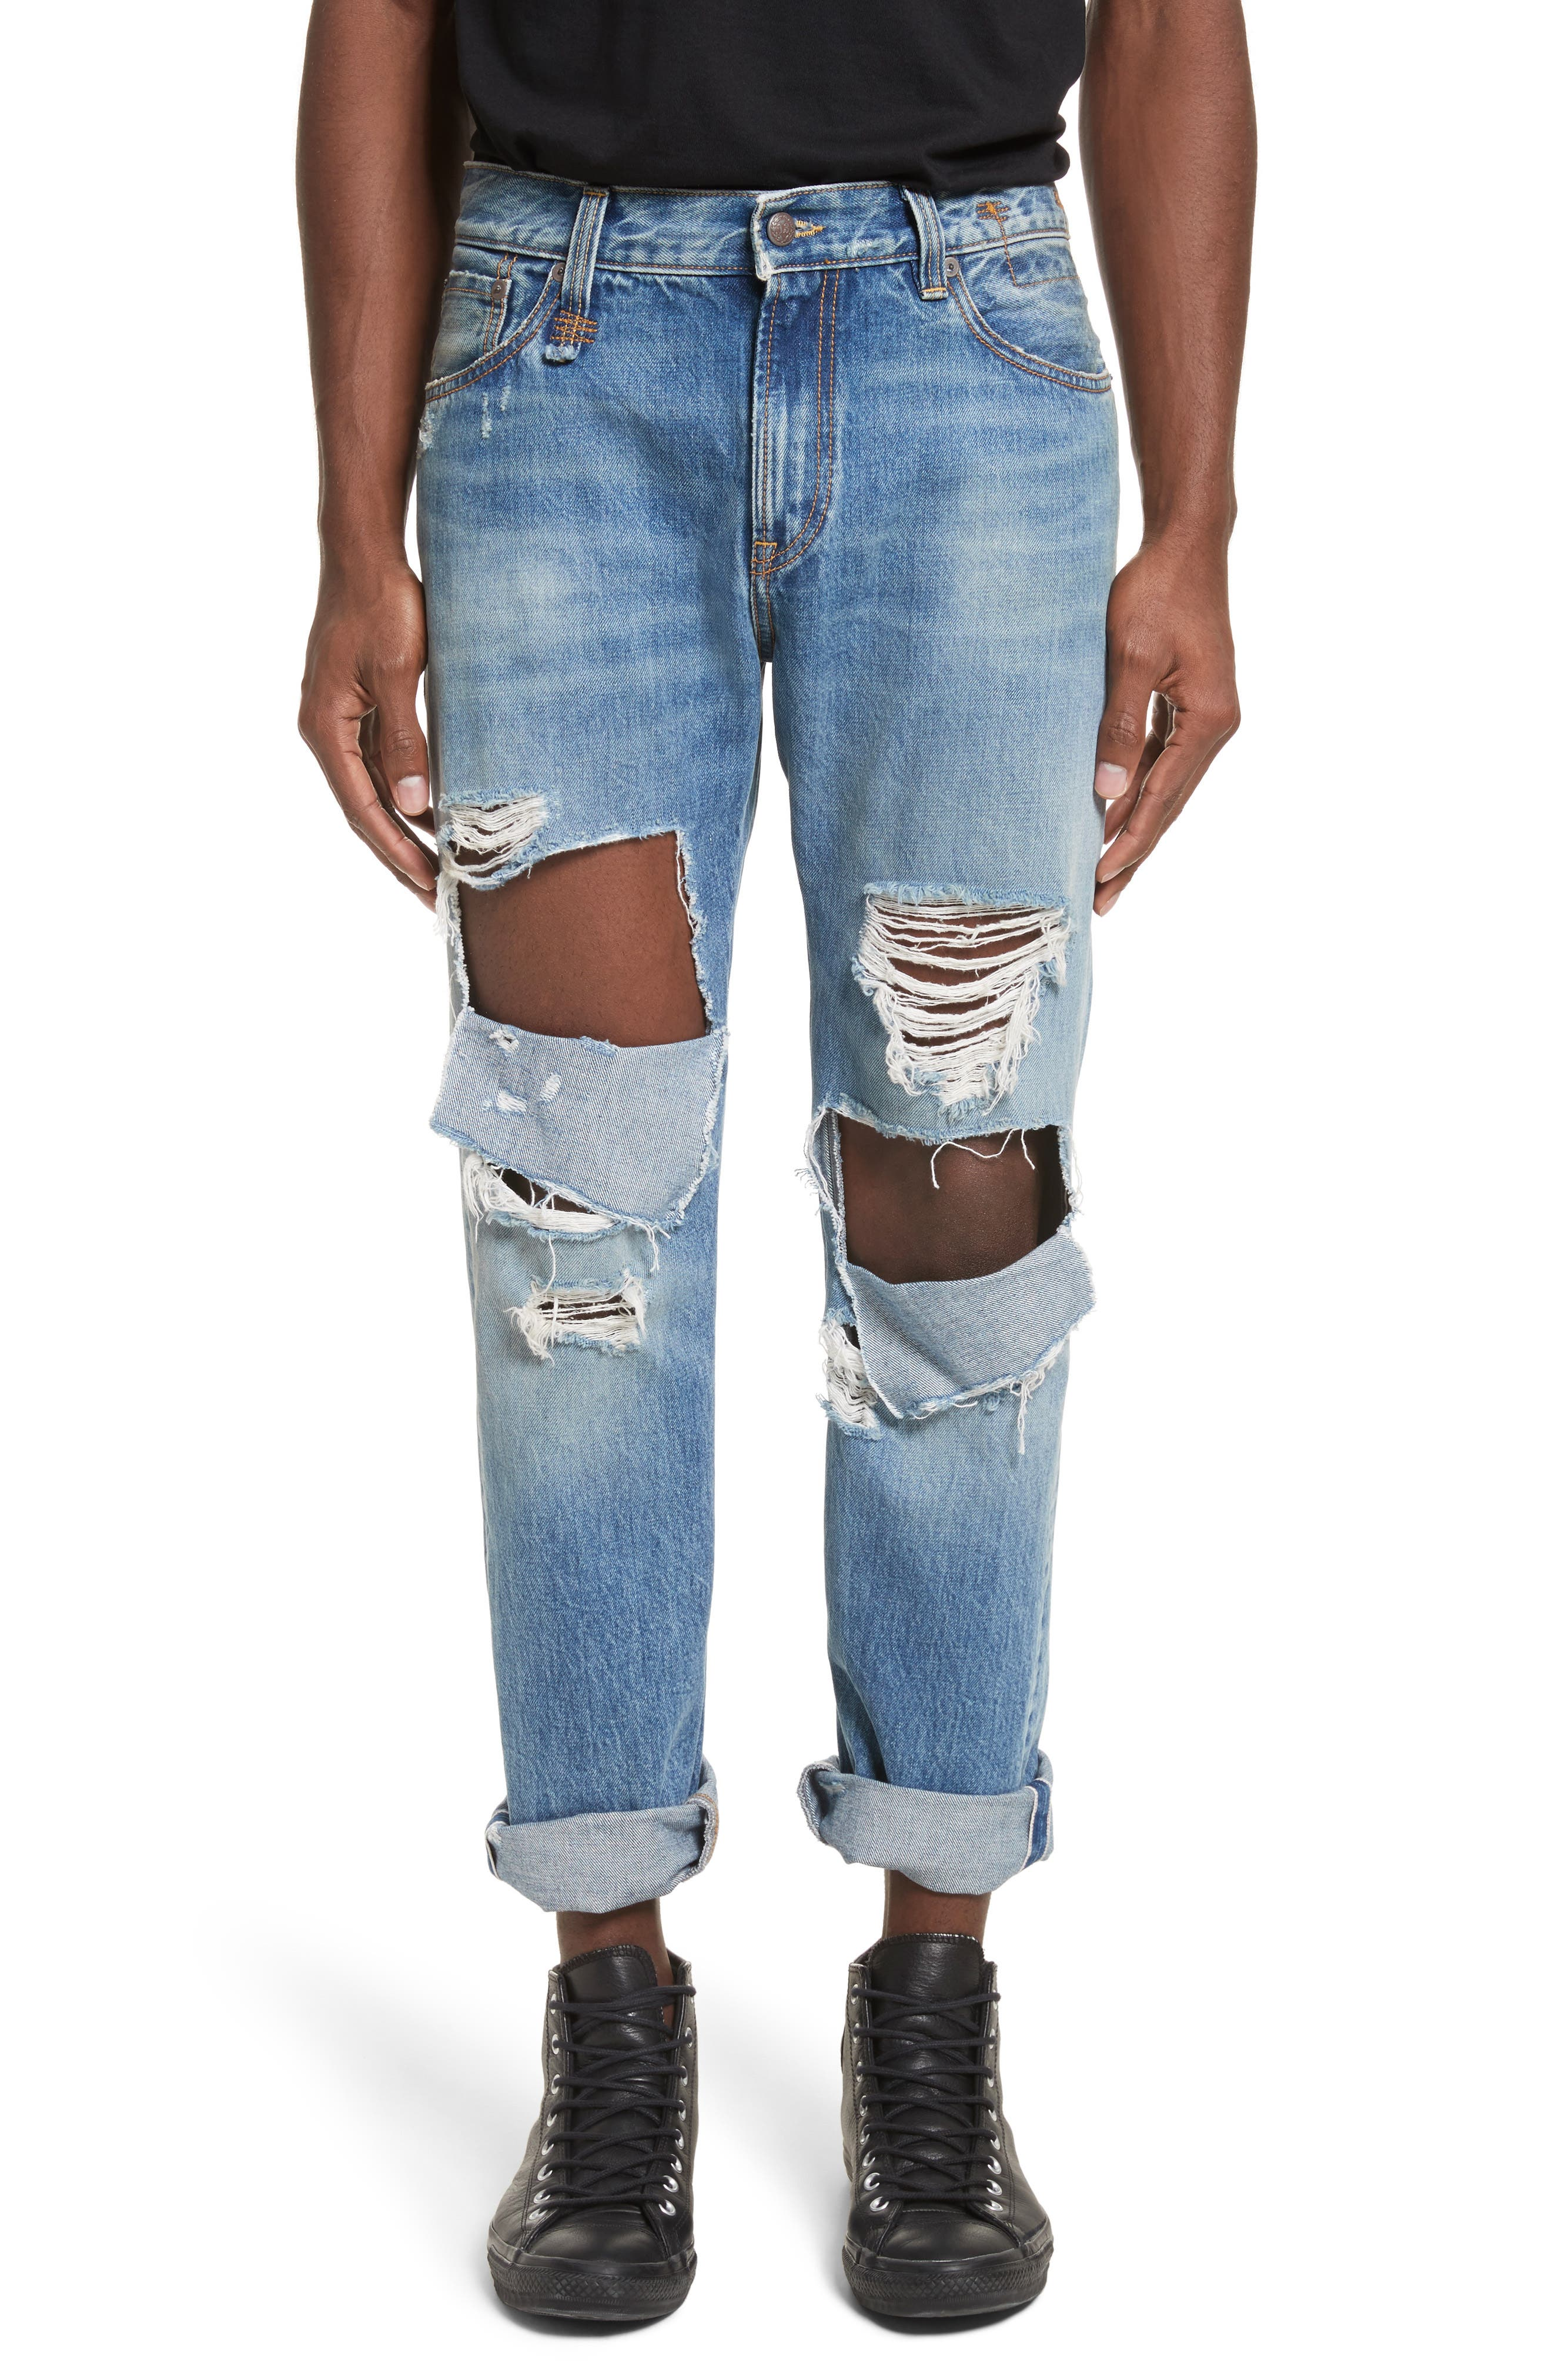 Sid Distressed Cutoff Straight Leg Jeans,                             Main thumbnail 1, color,                             Jasper Selvege W Rips